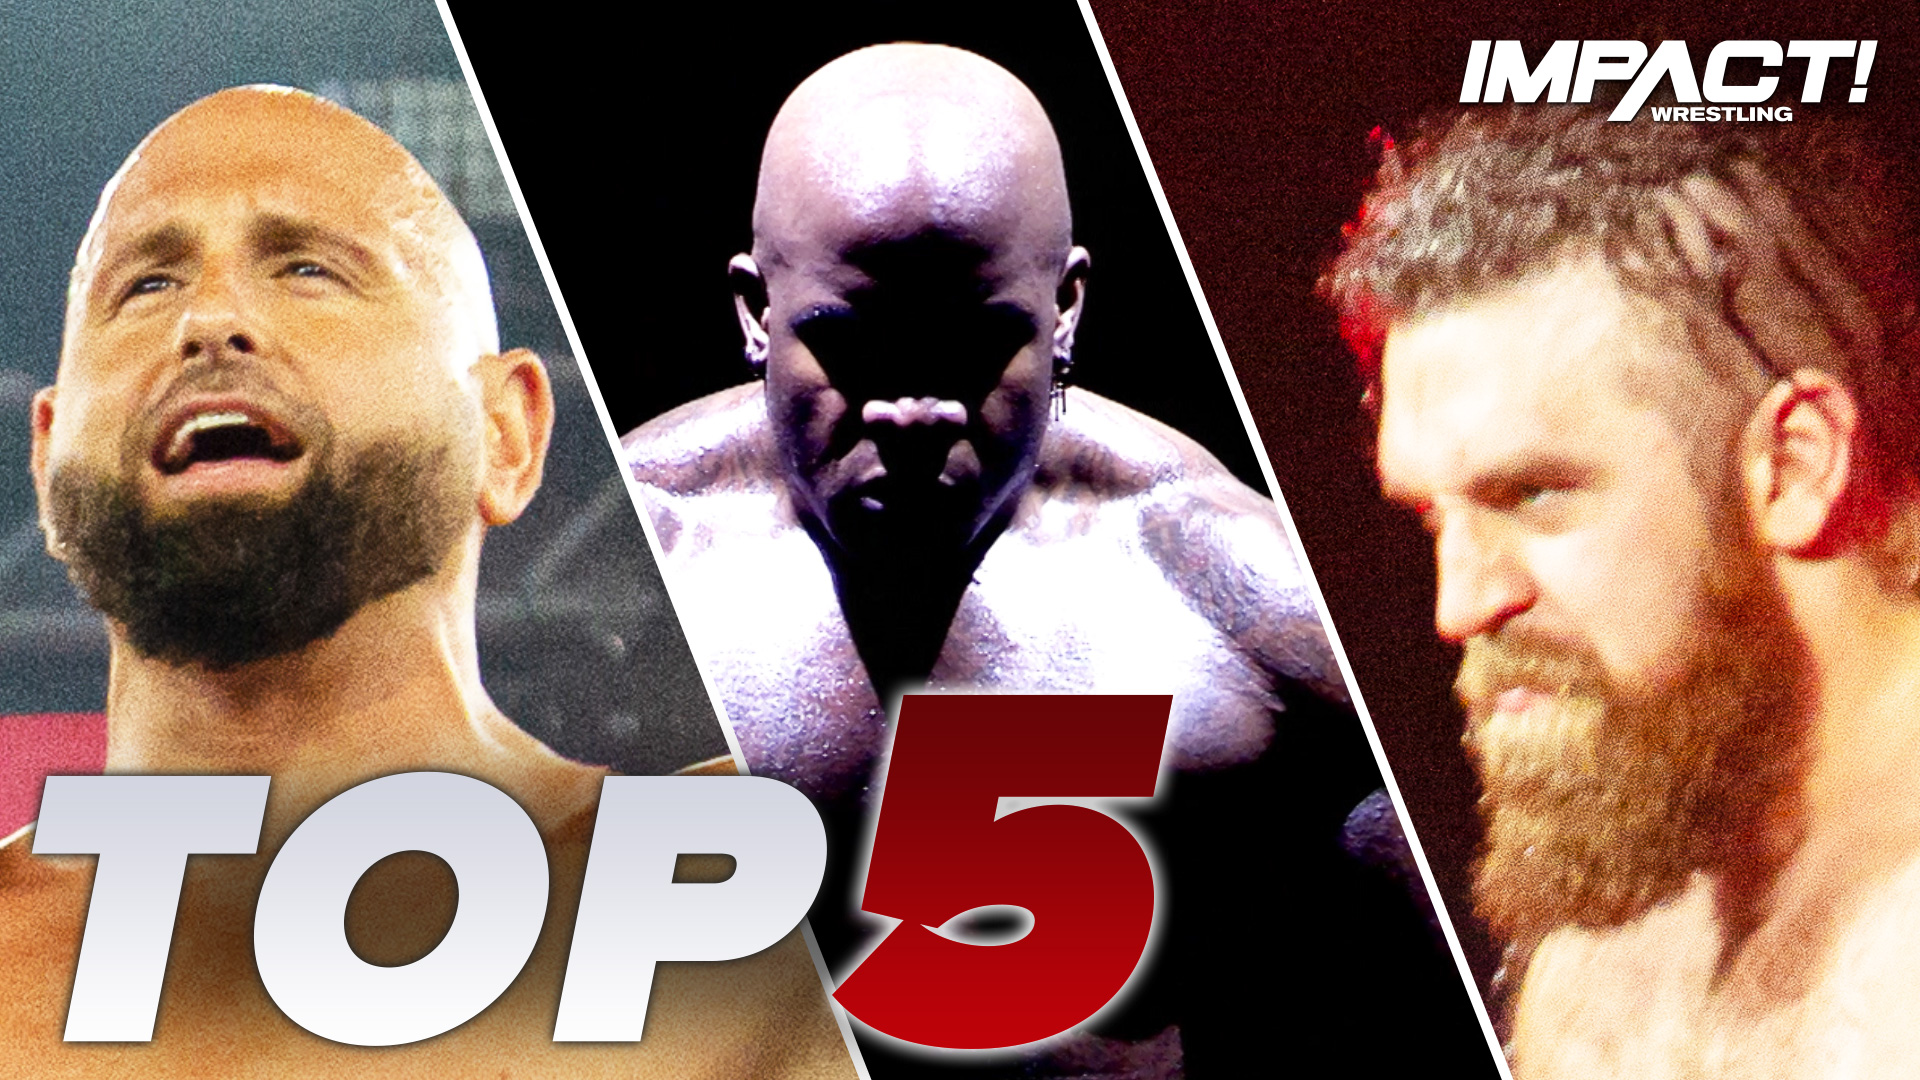 IMPACT! February 23, 2021 – IMPACT Wrestling